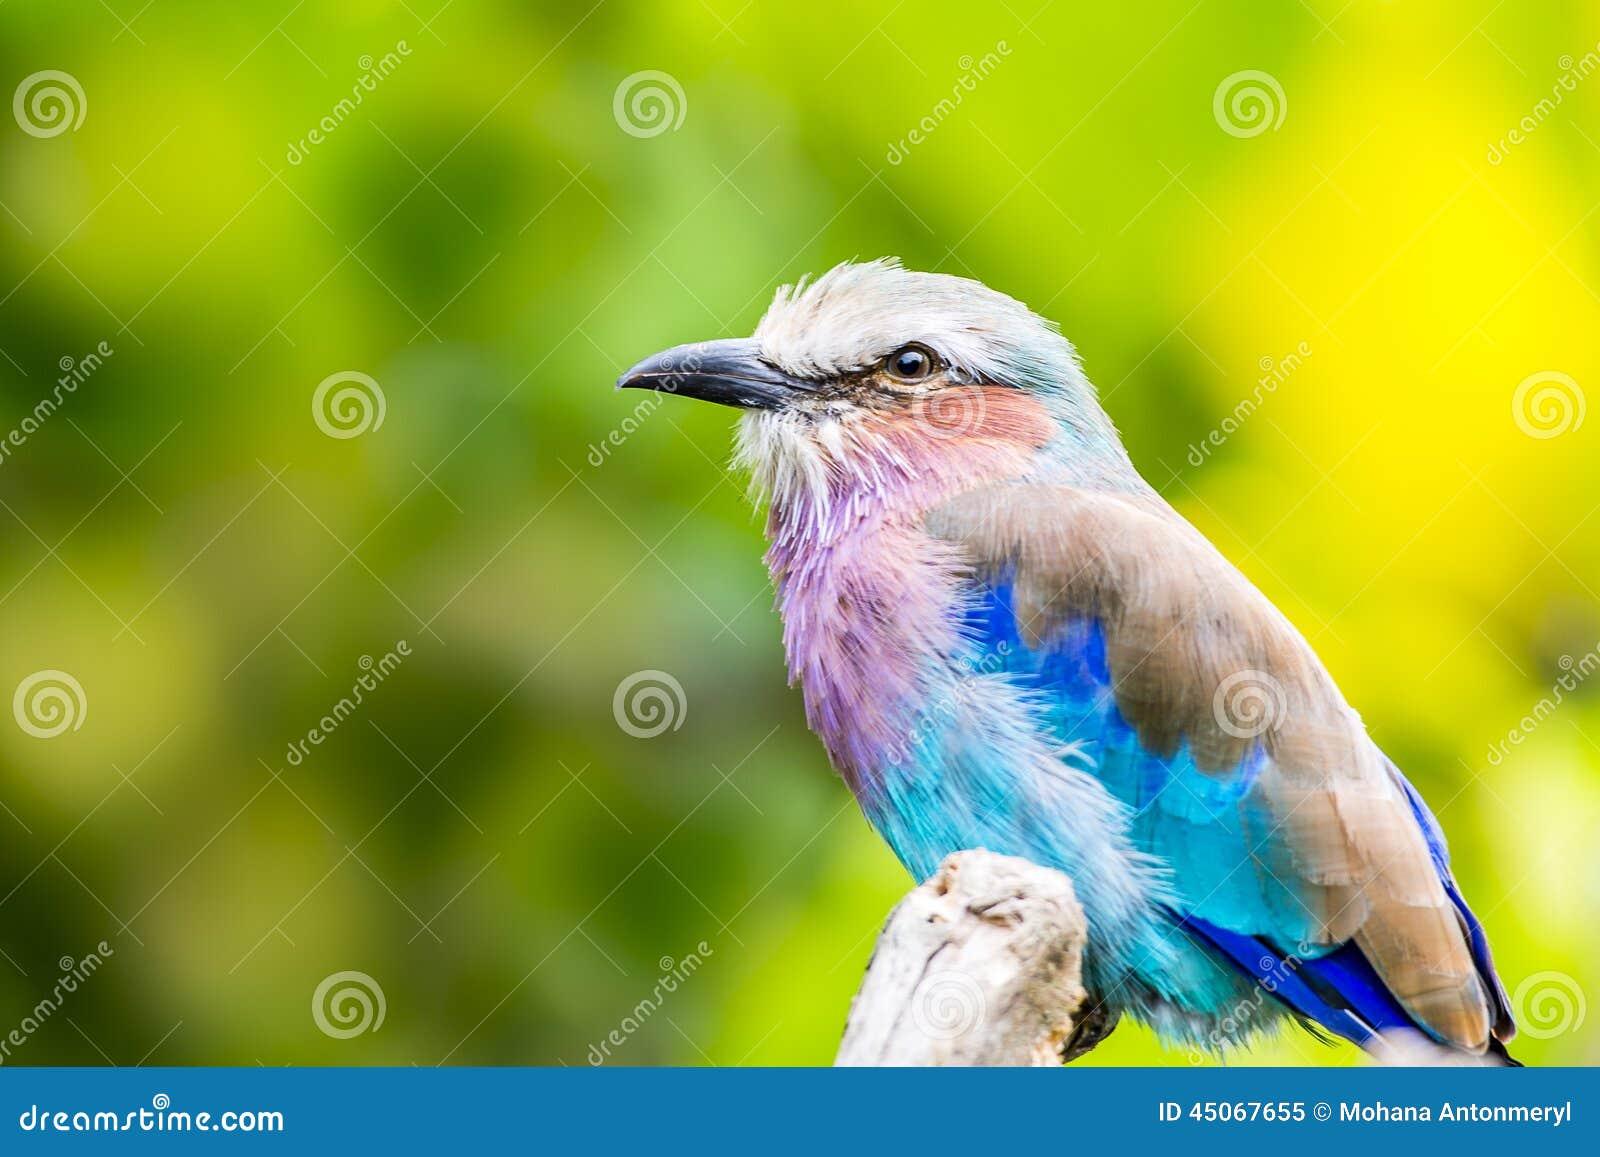 Rouleau lilas breasted par oiseau